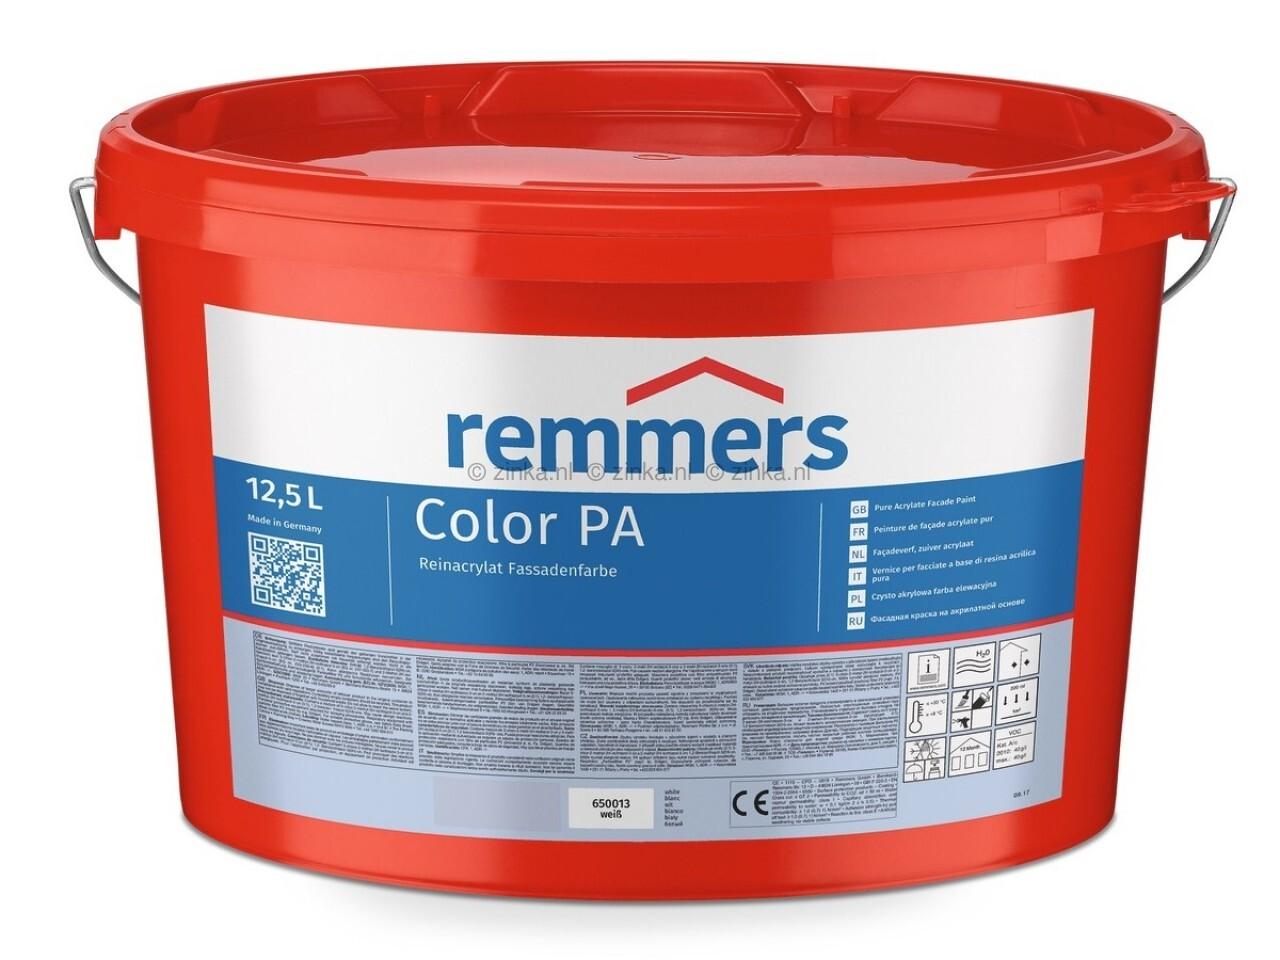 Remmers Color PA